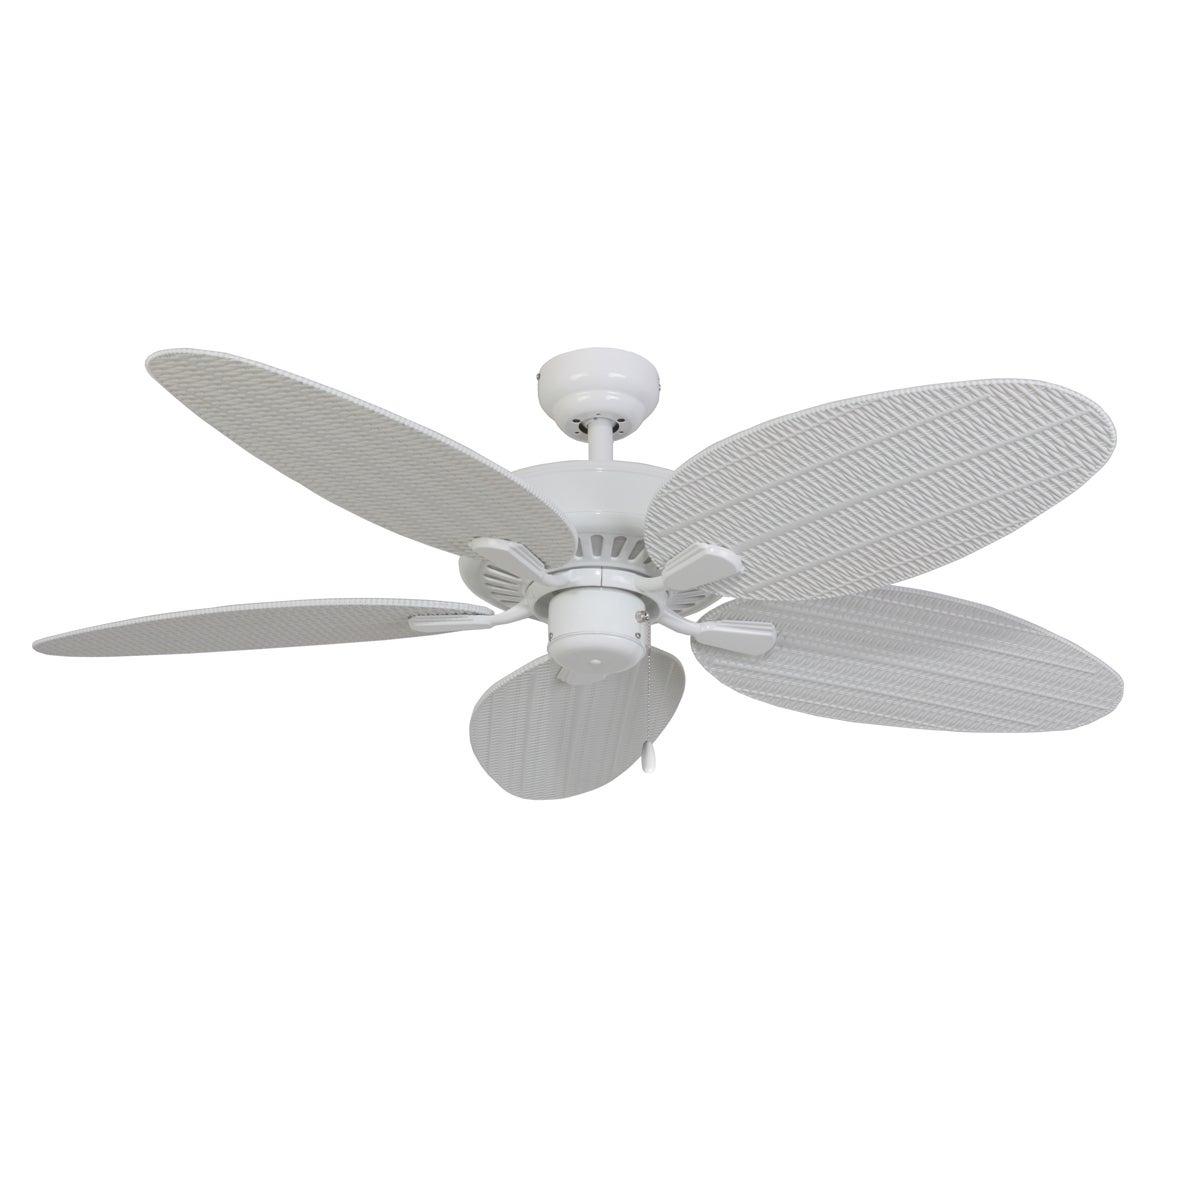 EcoSure Siesta Key White 52-inch 5-blade Ceiling Fan